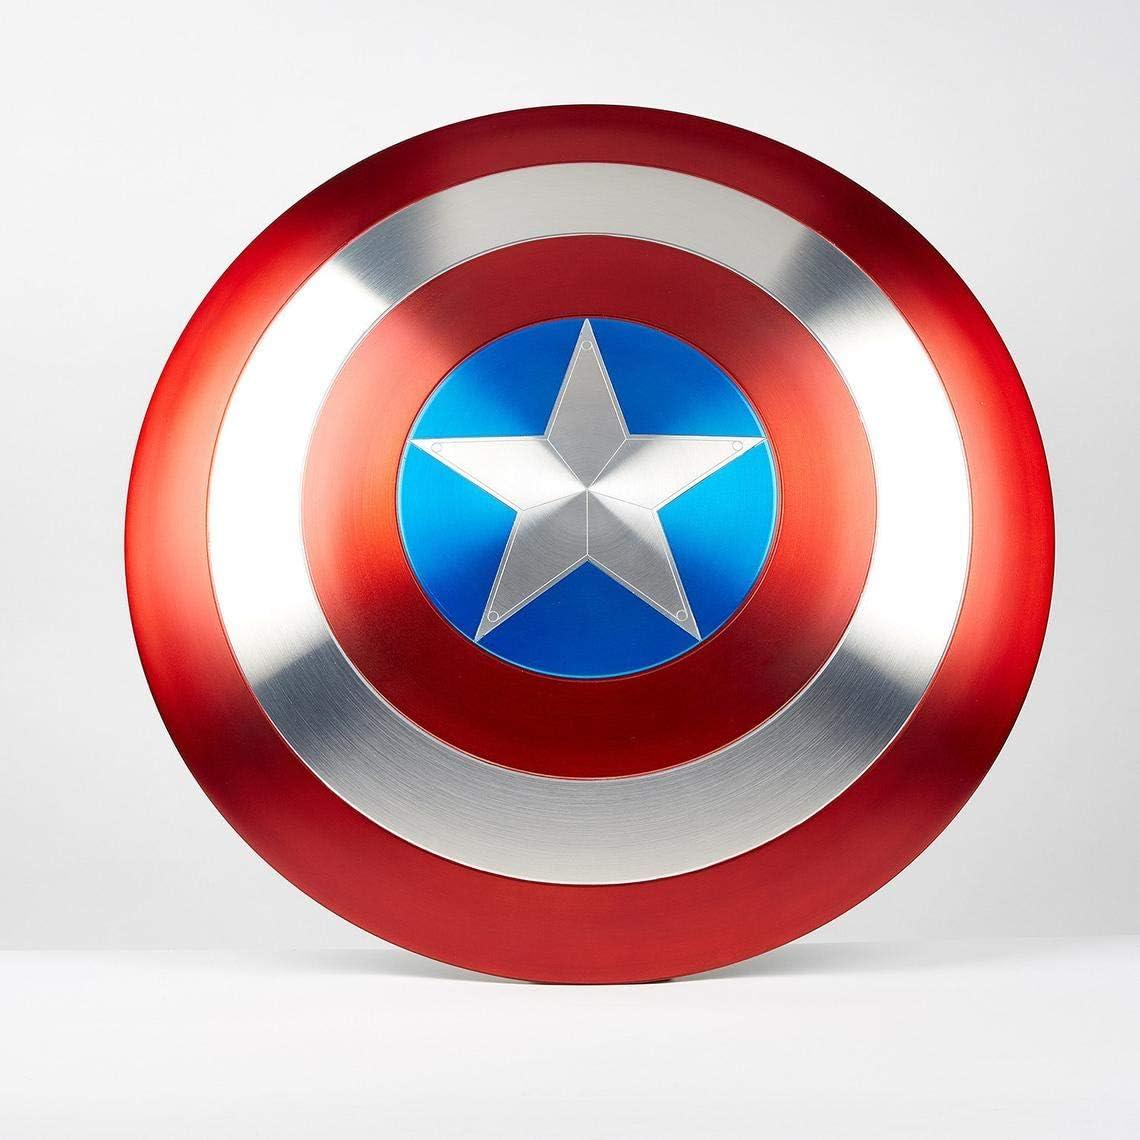 A S ENTERPRISES Captain America Shield   Metal Prop   Screen ...